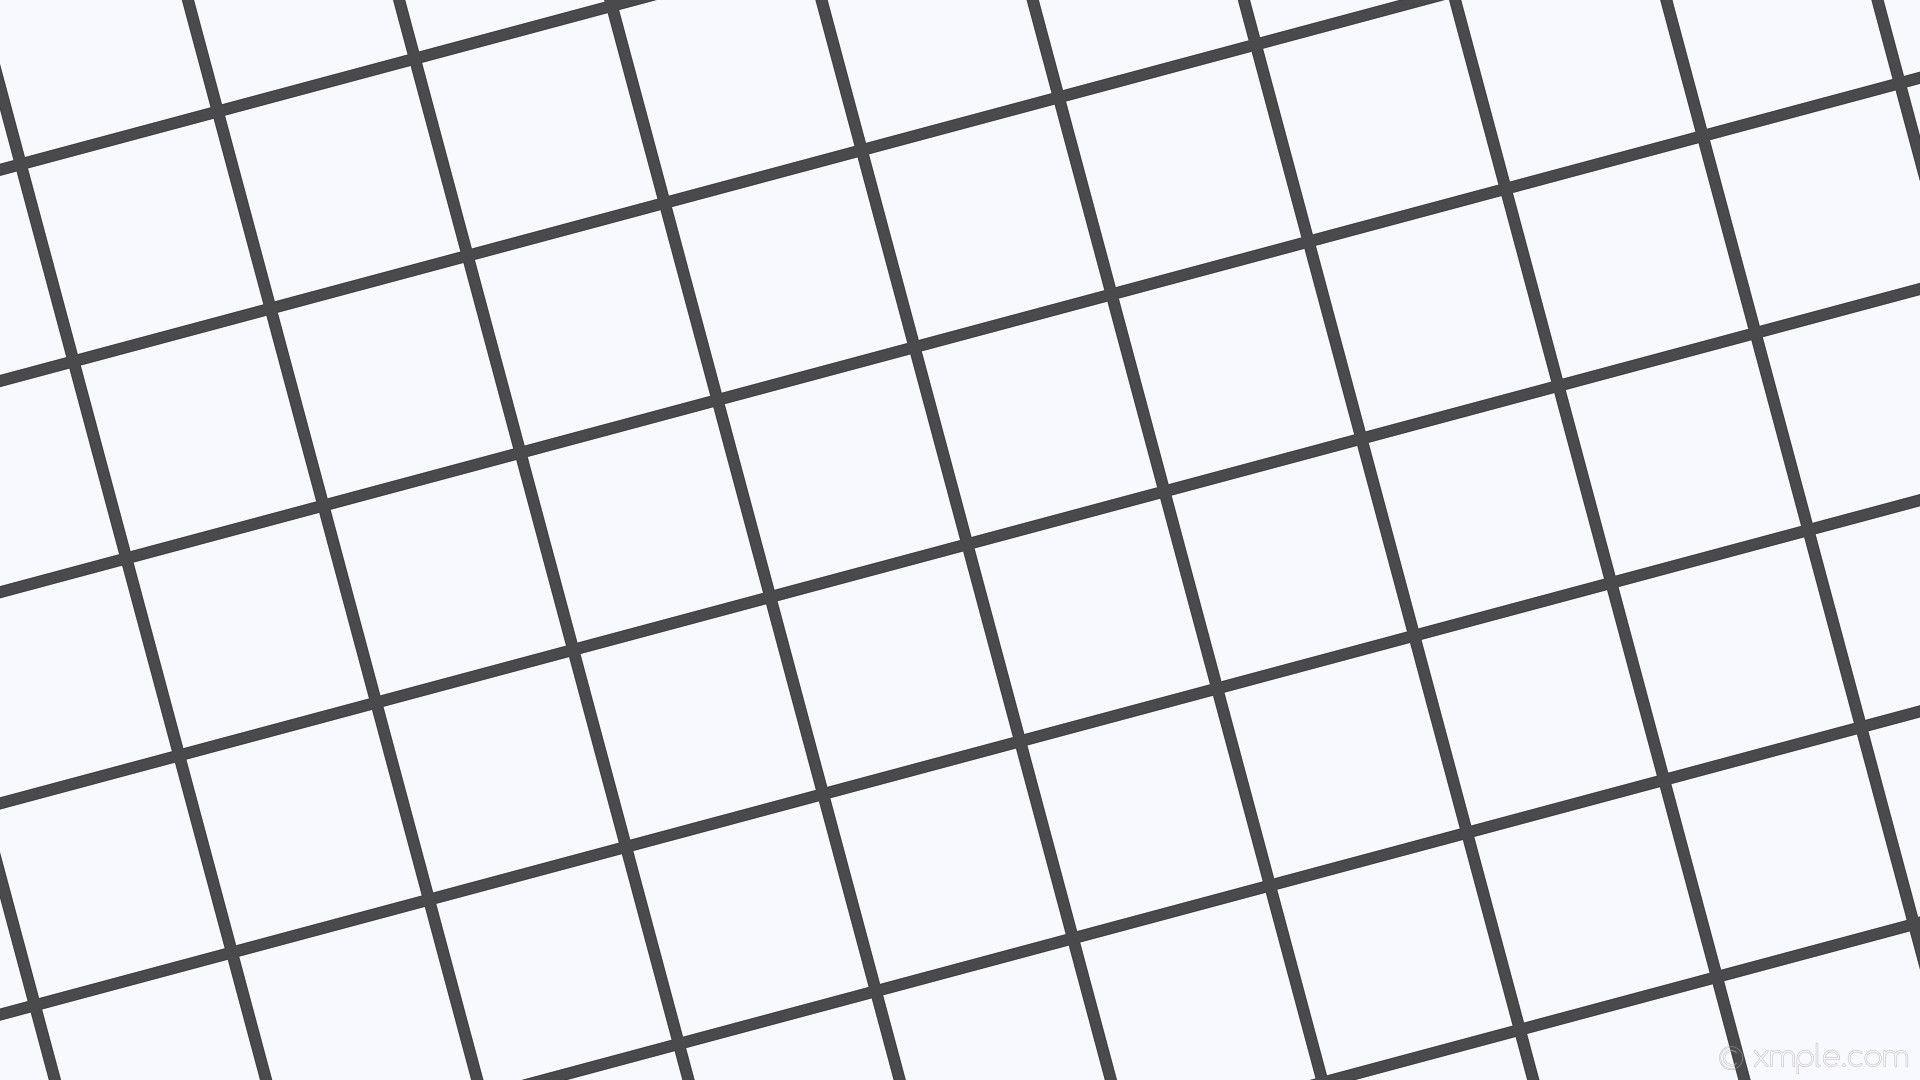 White Aesthetic Wallpaper theme